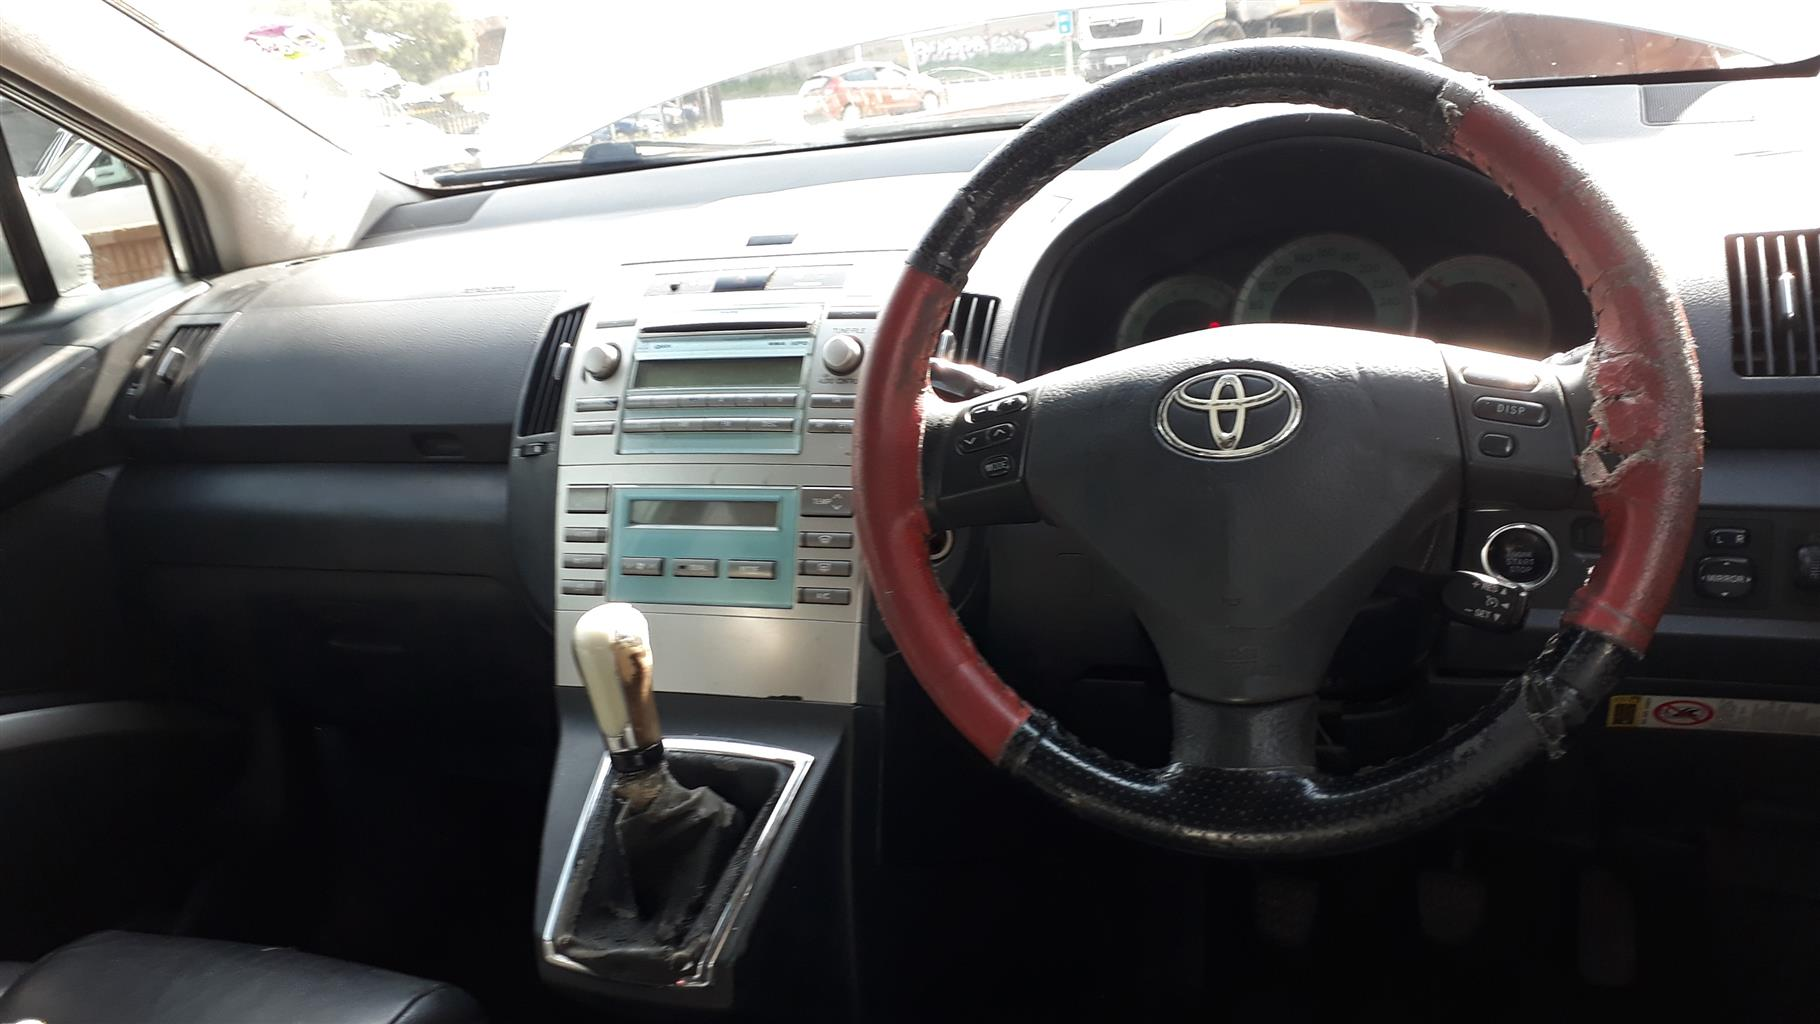 2009 Toyota Verso 1.6 S